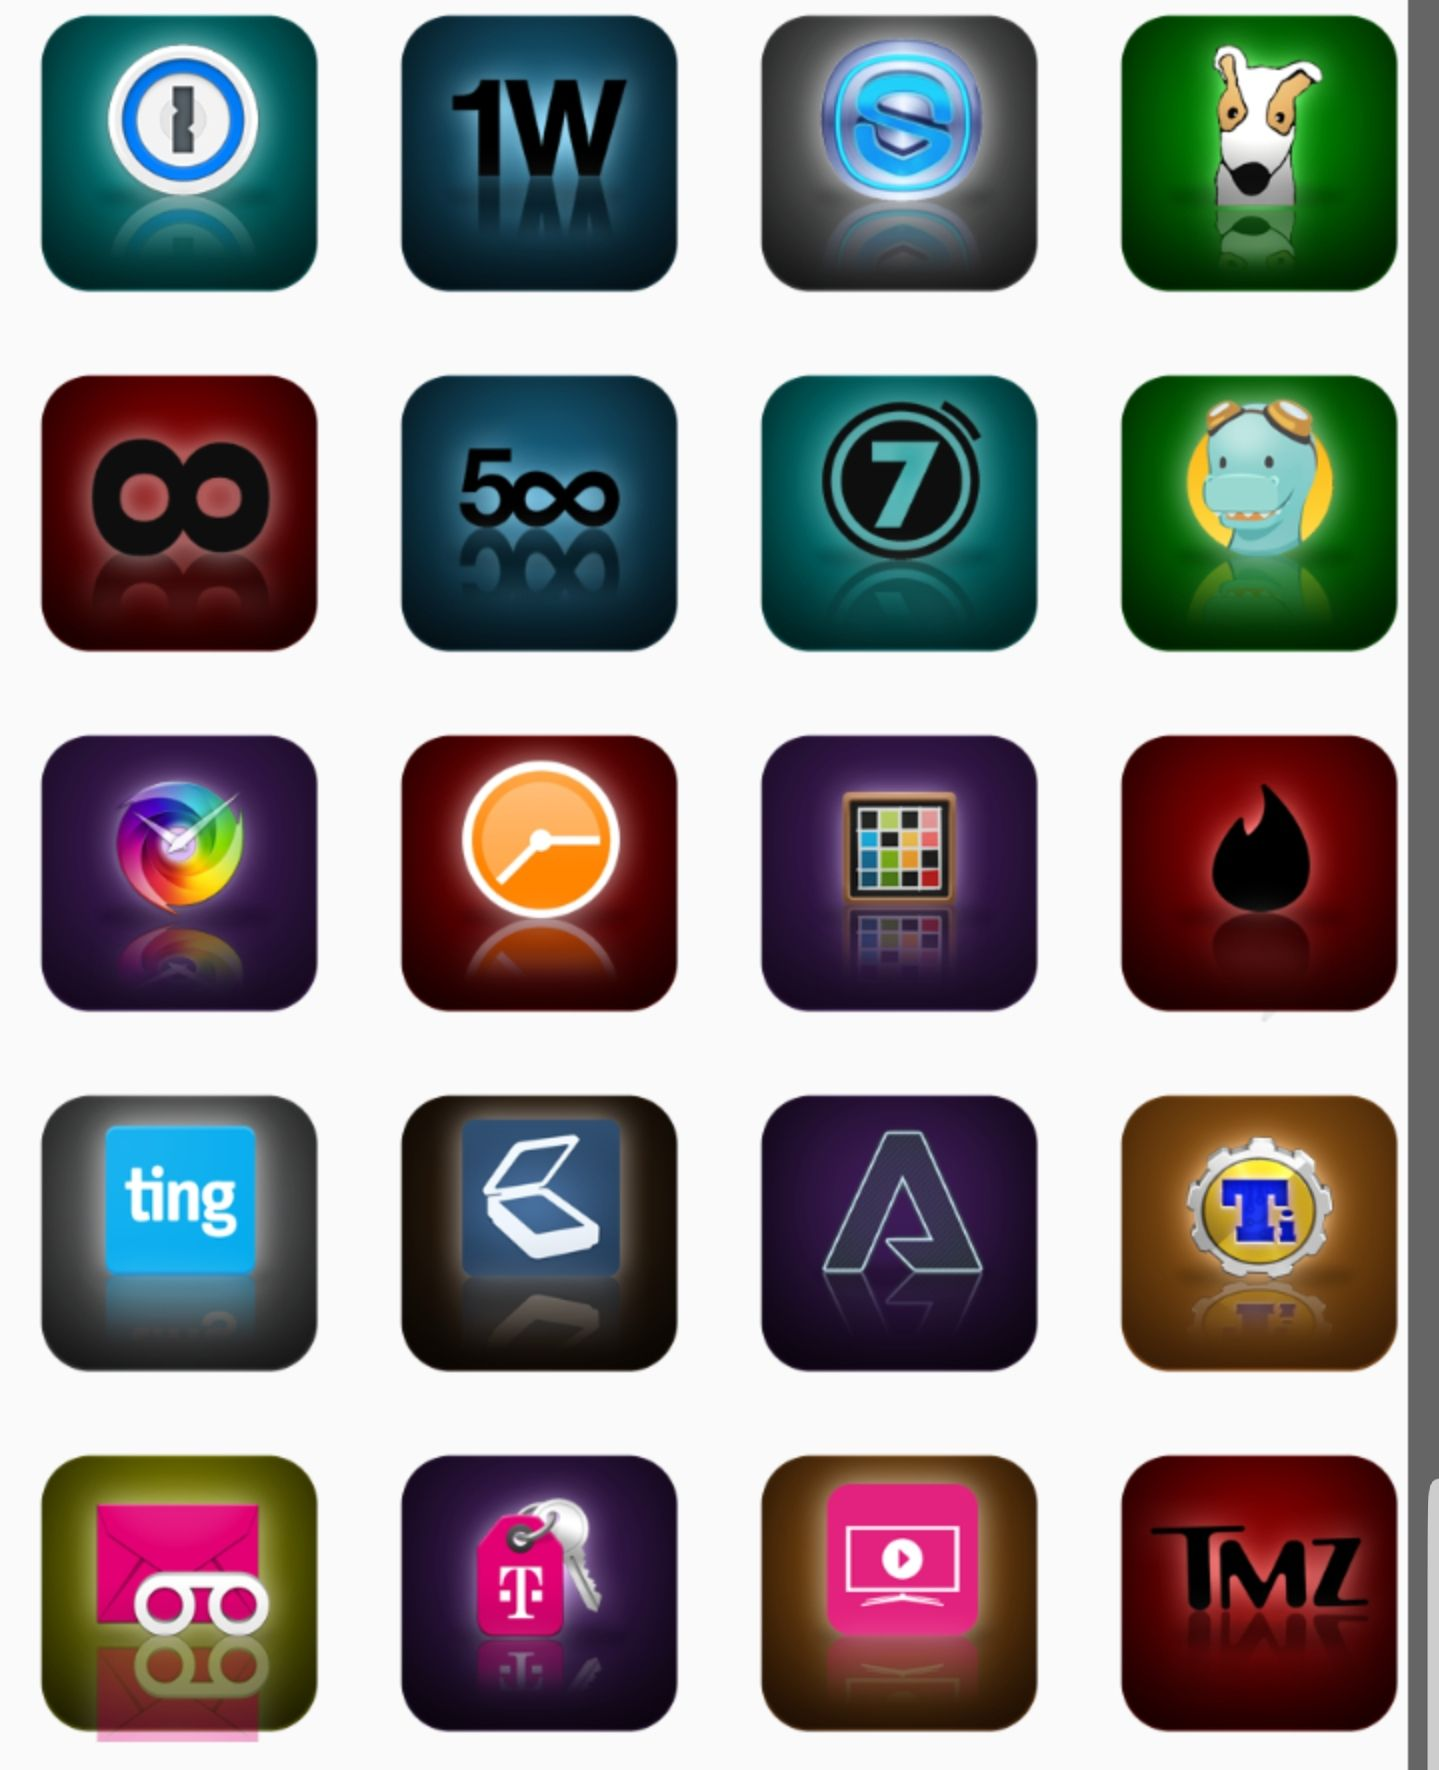 Elegate Pack De Iconos Para Tu Android Pack De Iconos Iconos Android